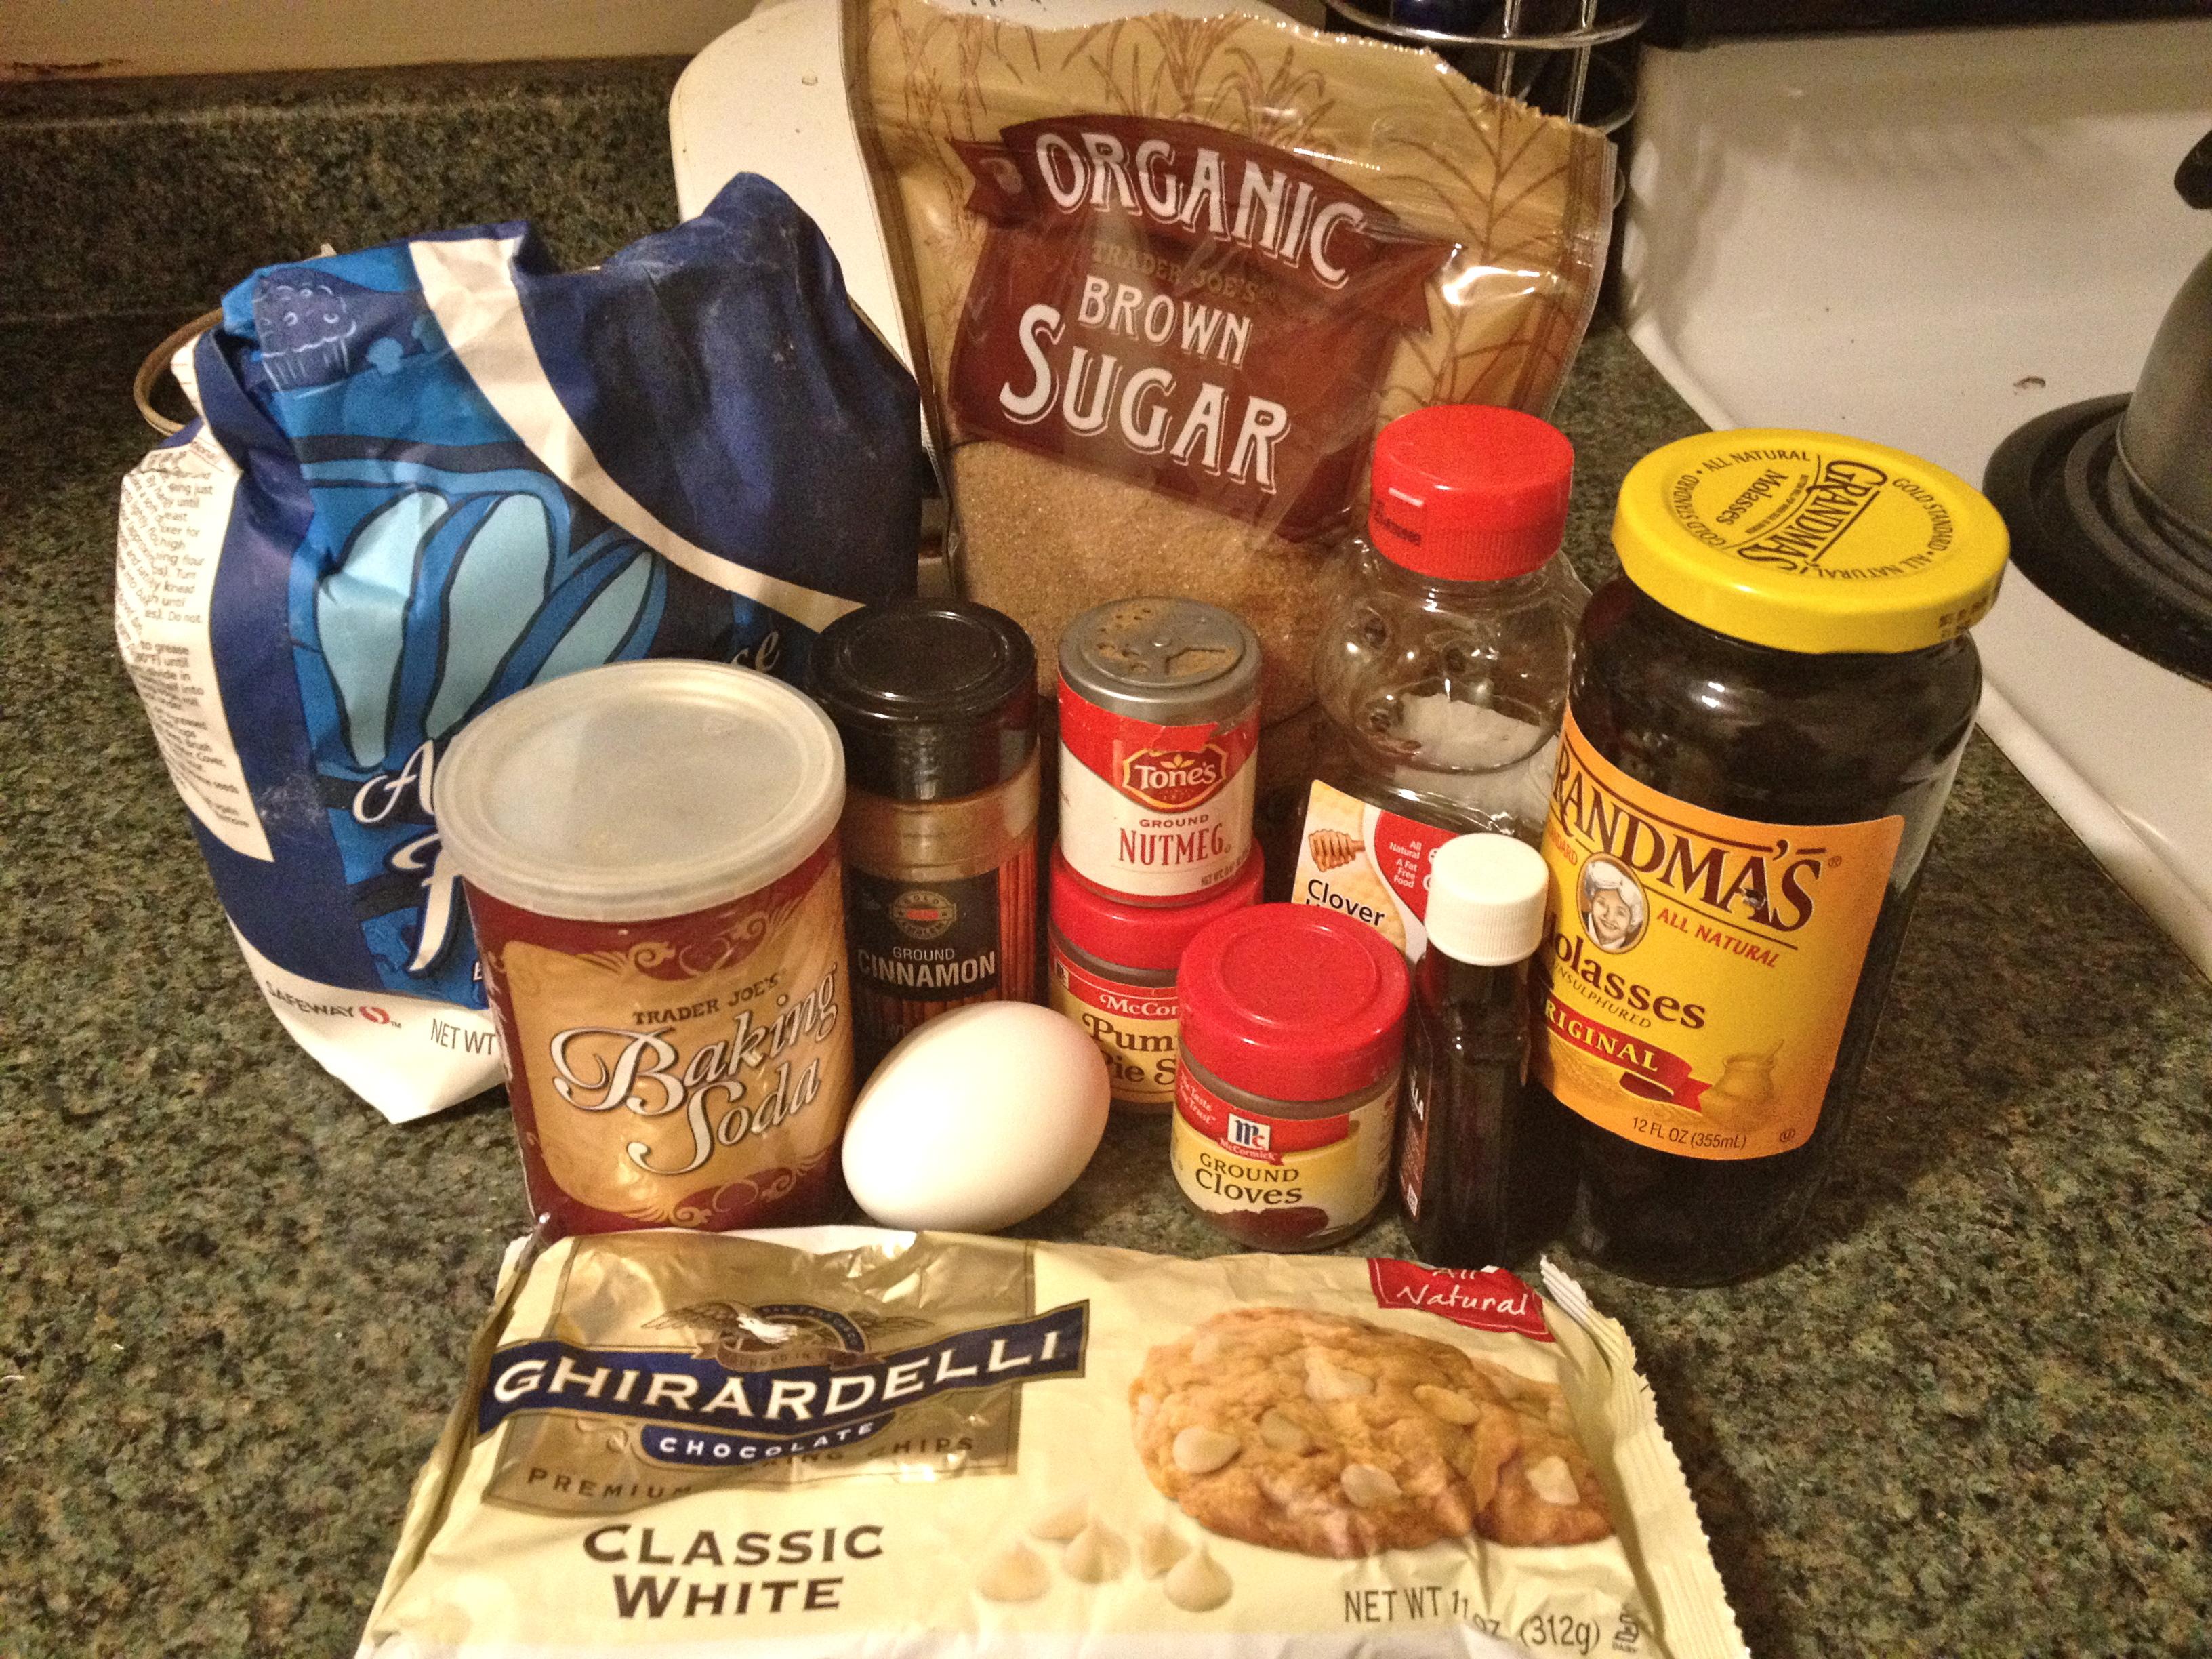 Gingerbread brownie supplies